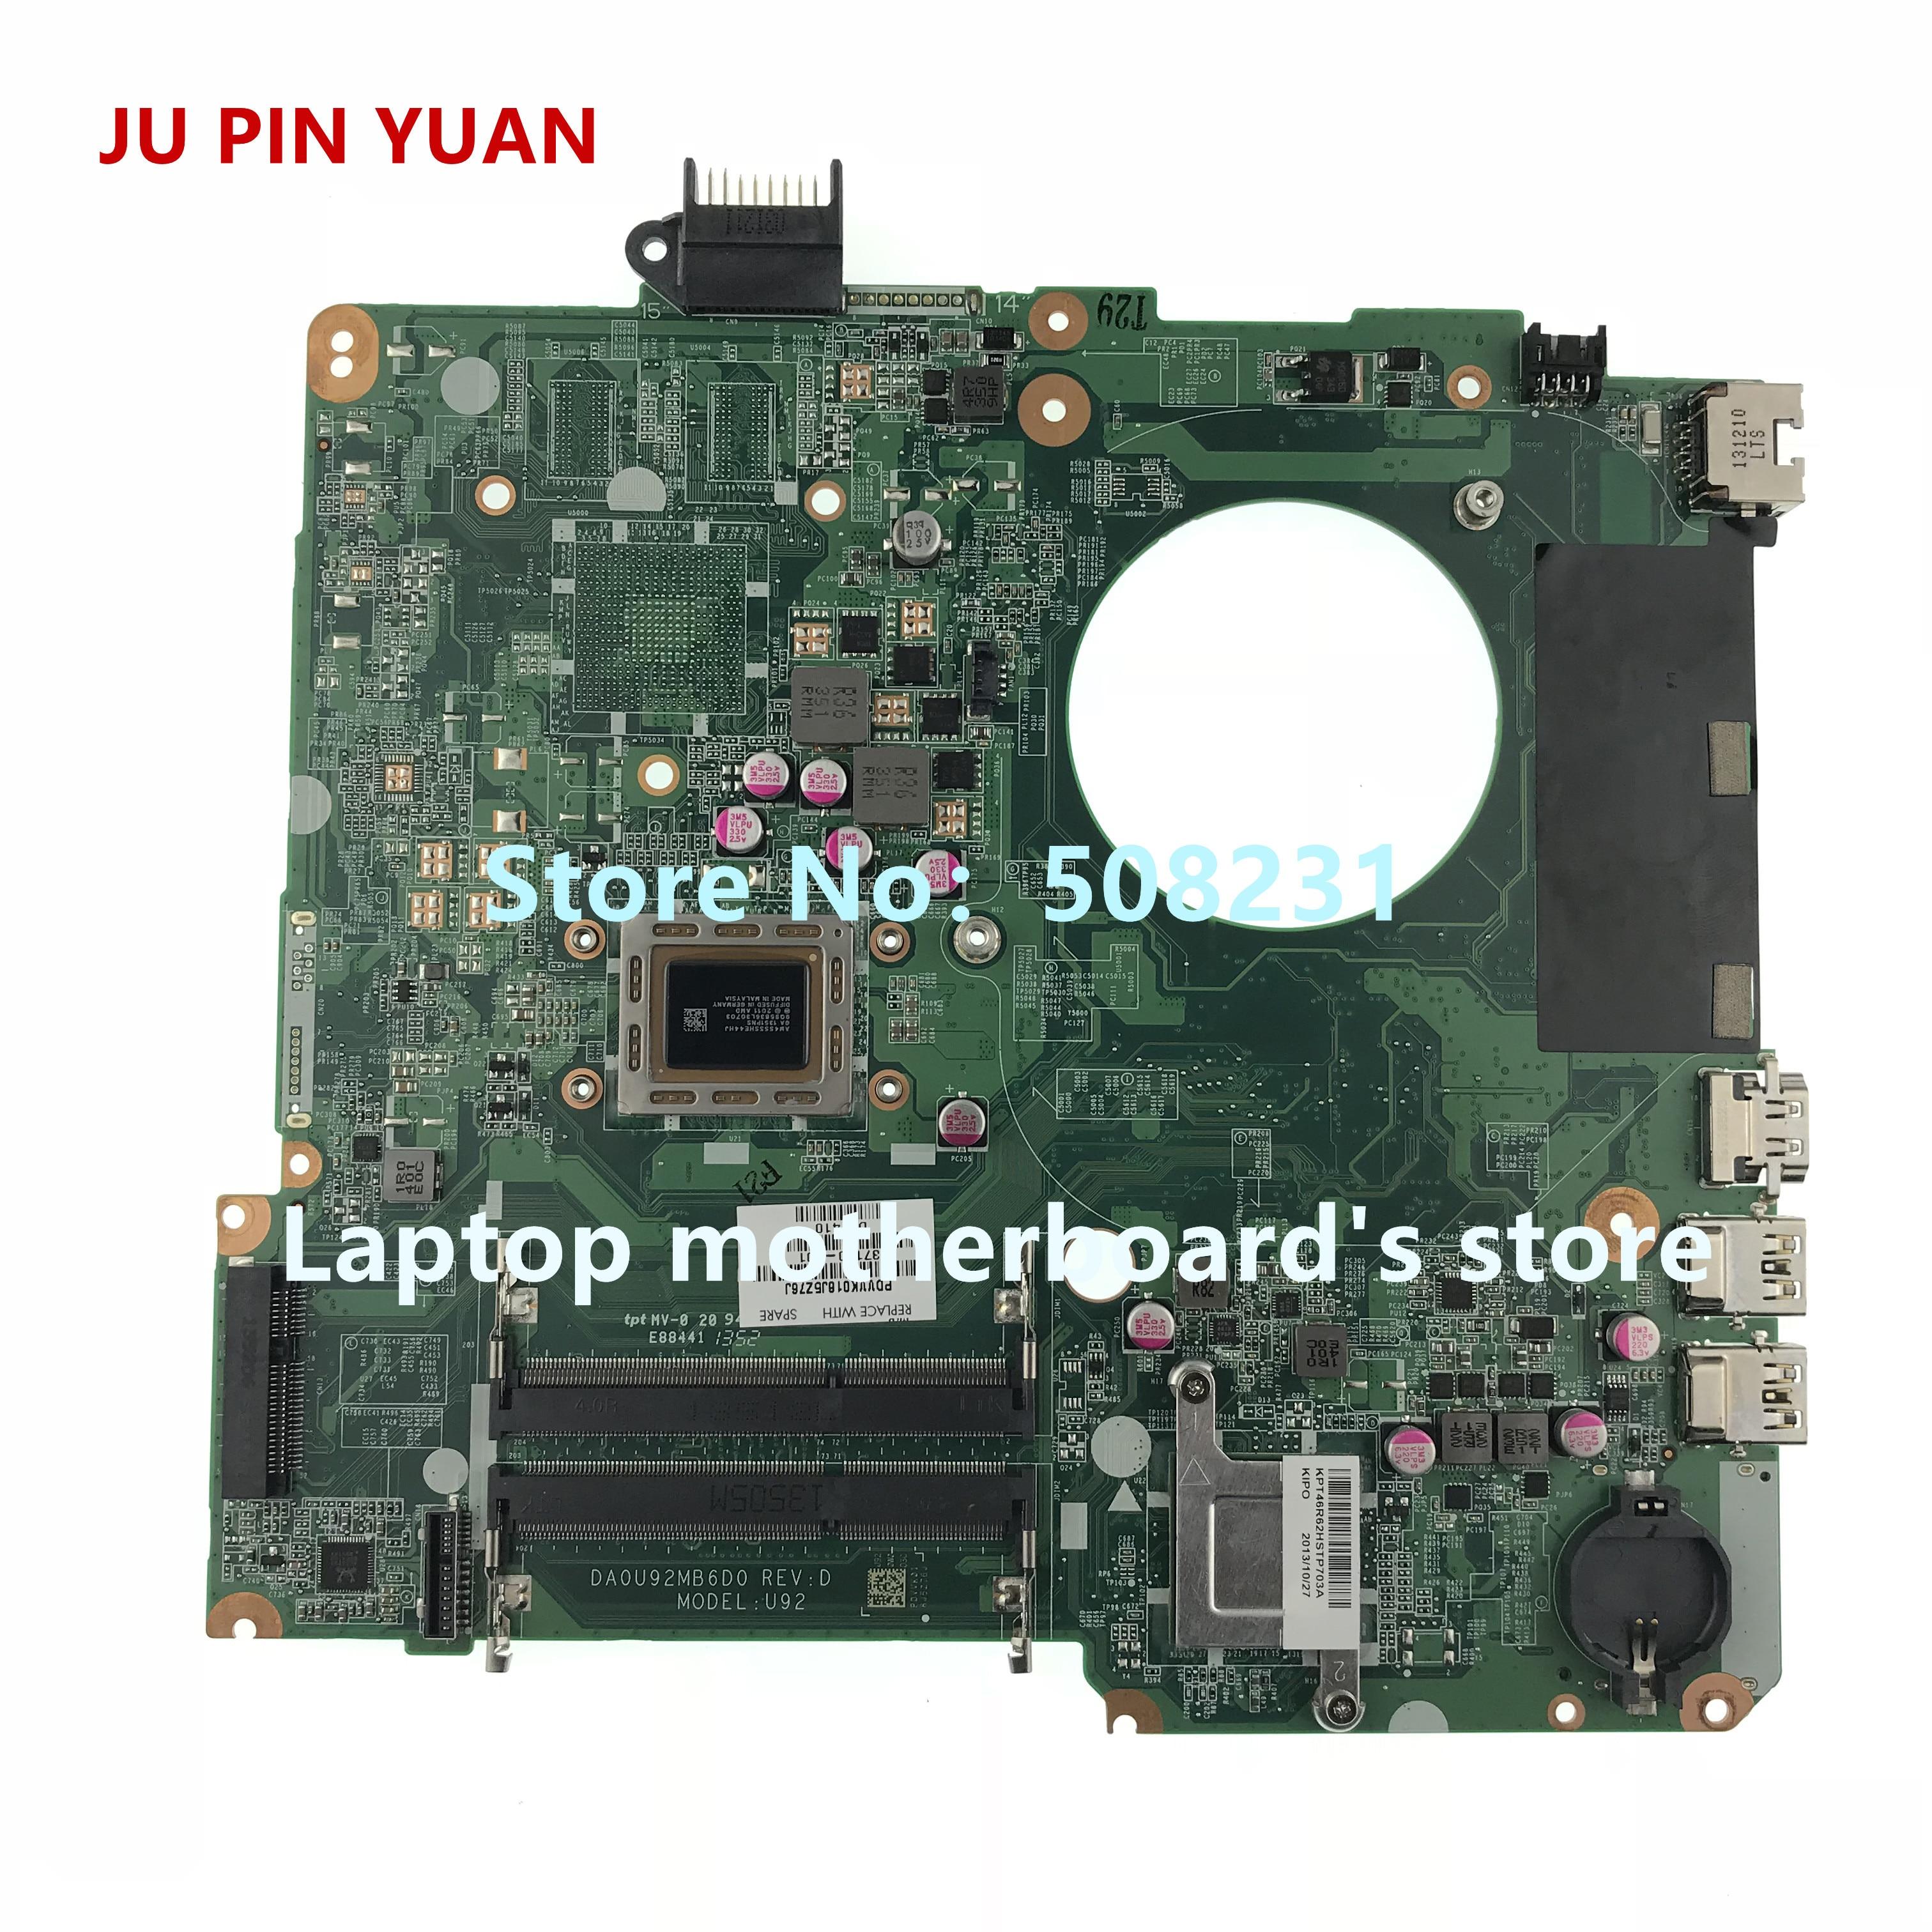 JU PIN YUAN 737140-501 737140-001 motherboard For HP PAVILION 15-N laptop motherboard U92 DA0U92MB6D0  A8-4555M fully TestedJU PIN YUAN 737140-501 737140-001 motherboard For HP PAVILION 15-N laptop motherboard U92 DA0U92MB6D0  A8-4555M fully Tested